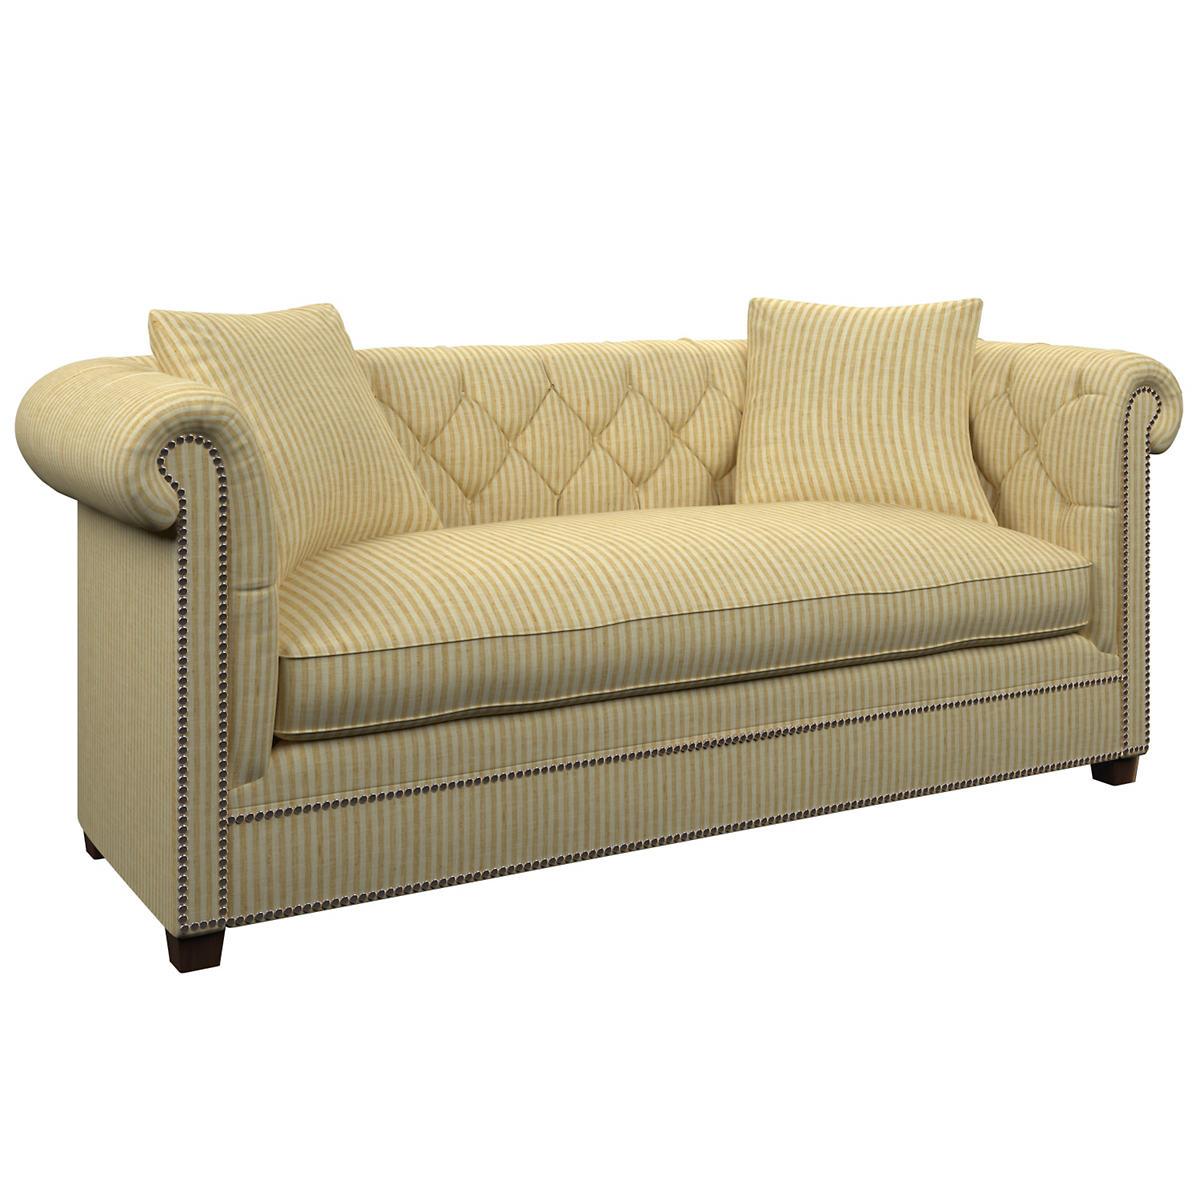 Adams Ticking Gold Richmond Sofa